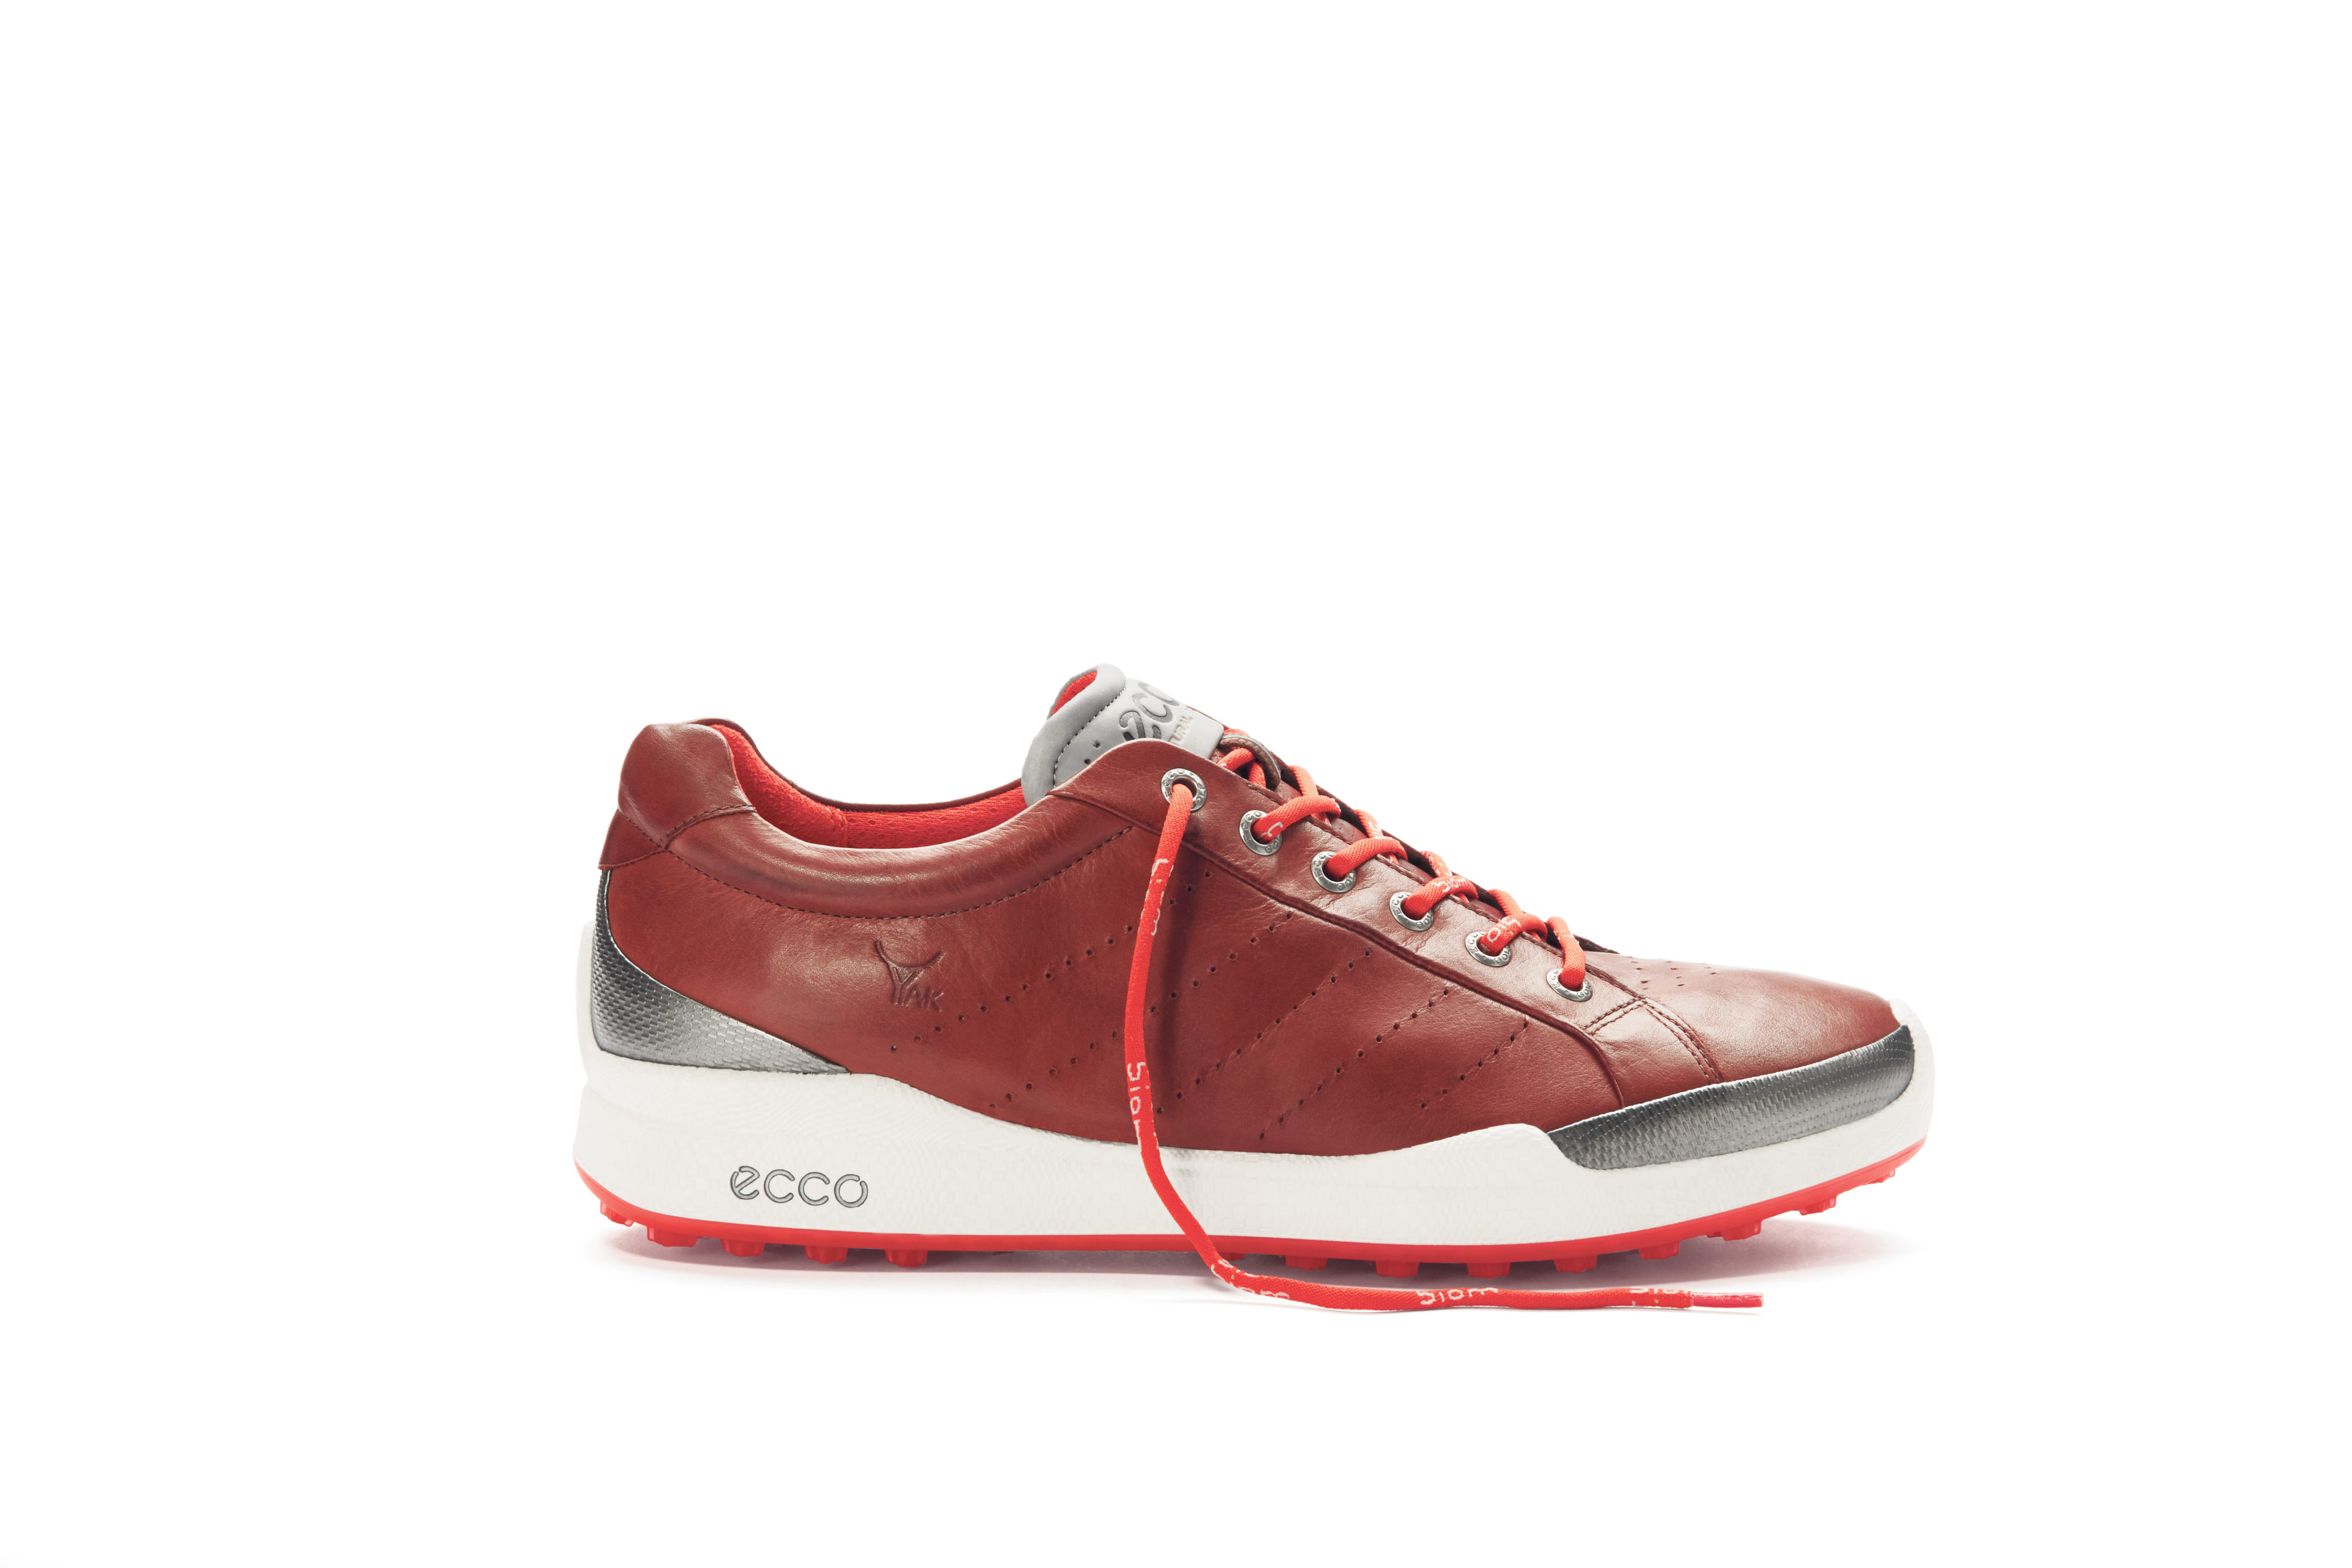 Ecco BIOm Hybrid Natural Motion golf shoes